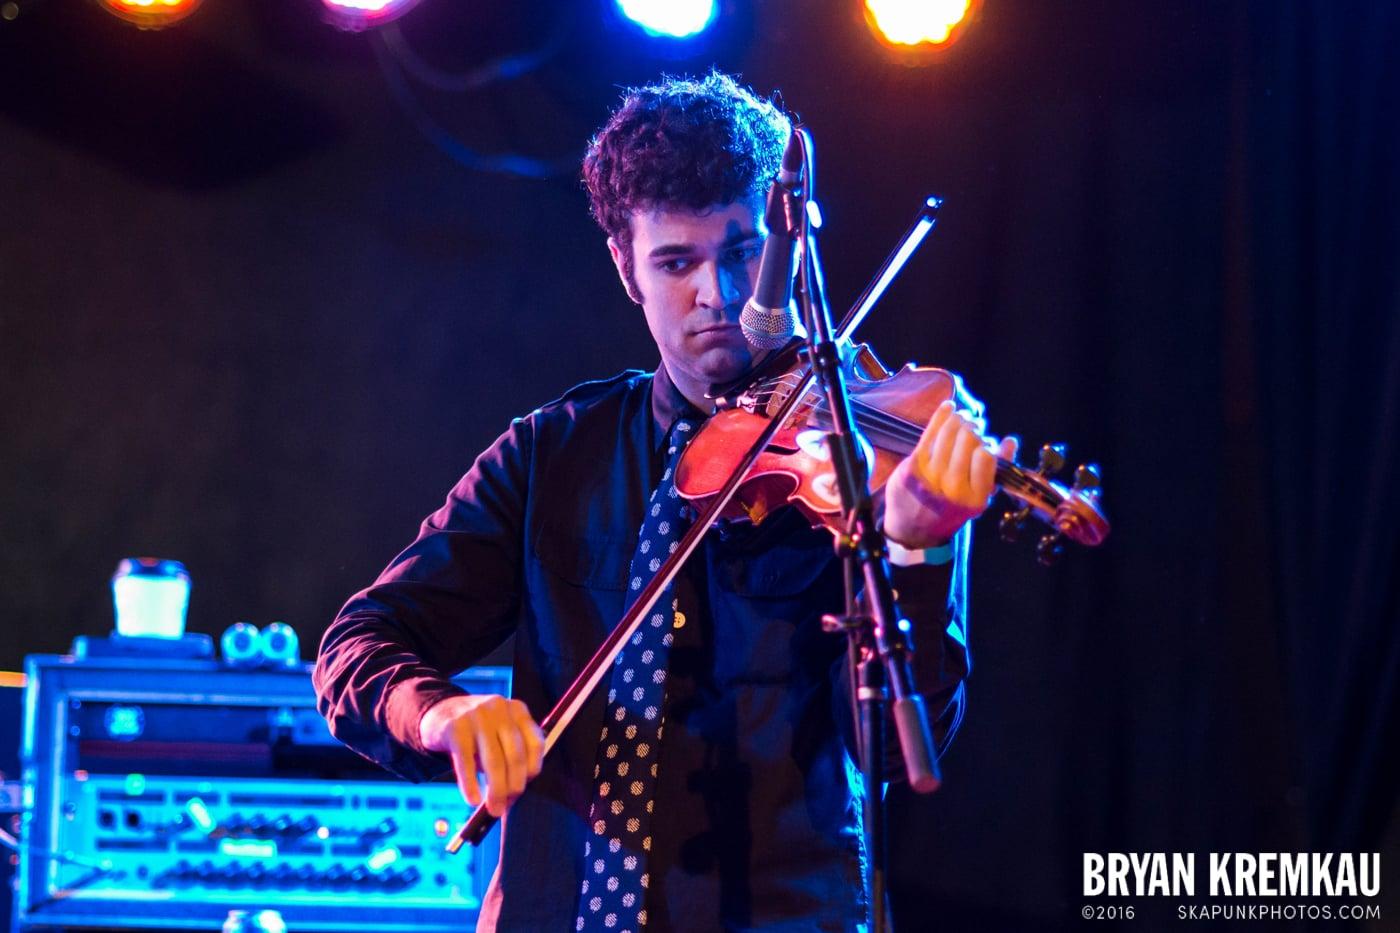 Danny Burns Band @ Knitting Factory, Brooklyn, NY - 9.10.14 (19)